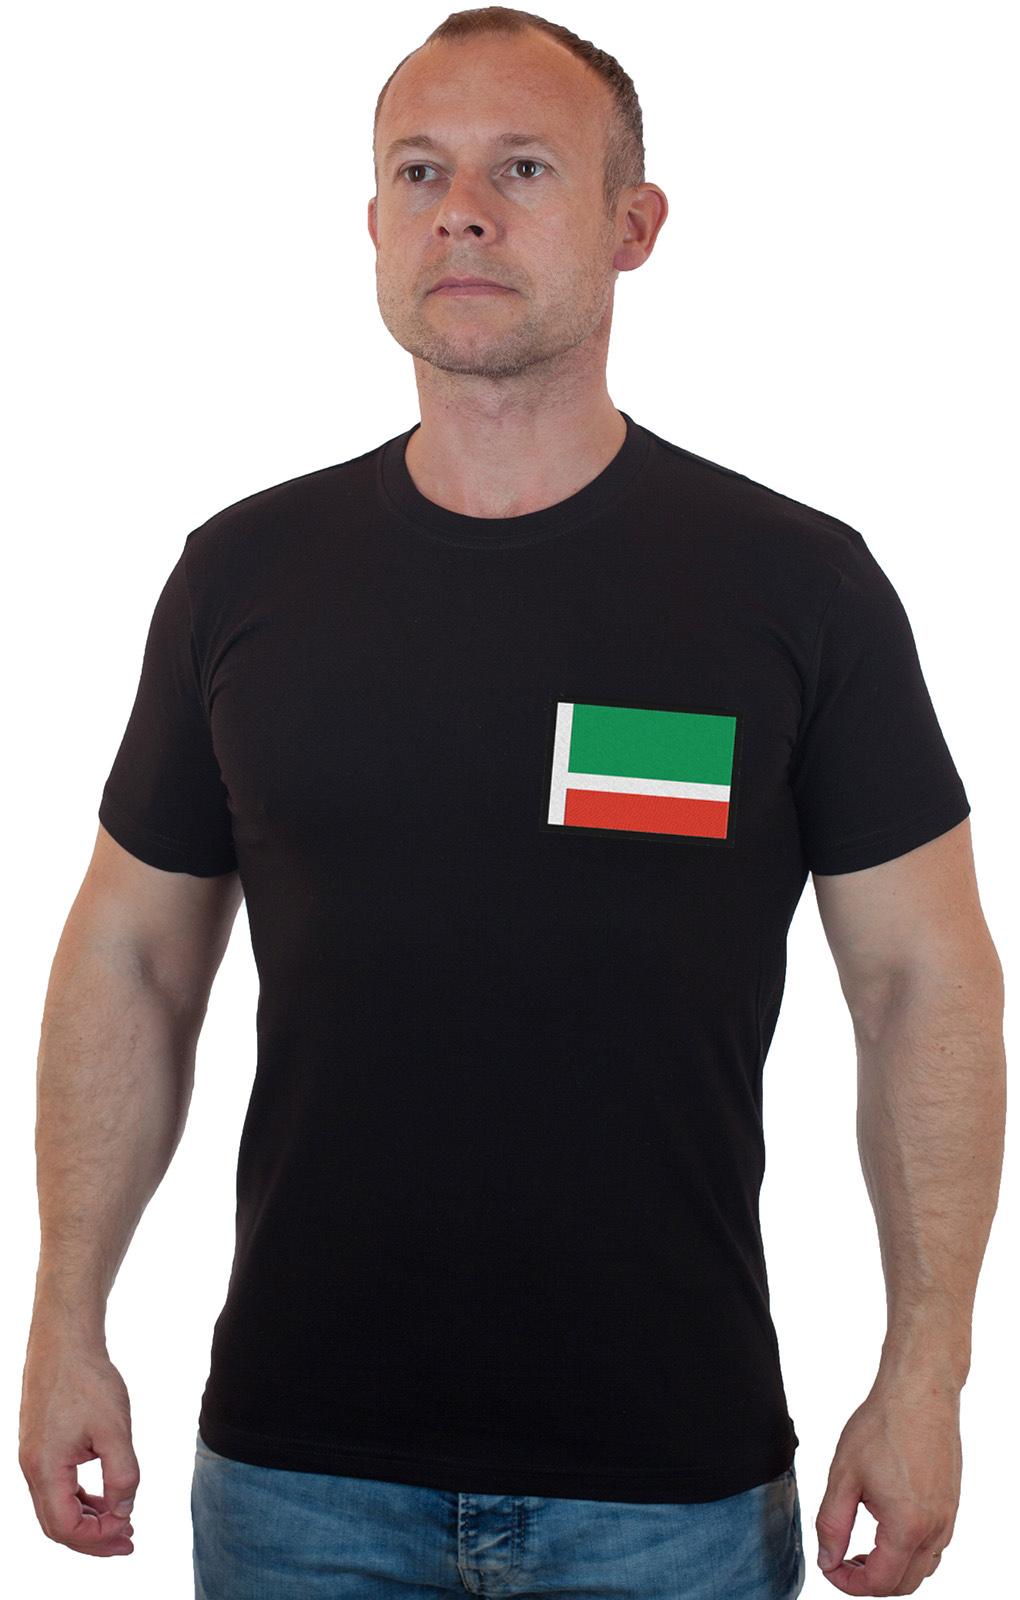 Мужская черная футболка с флагом Чечни